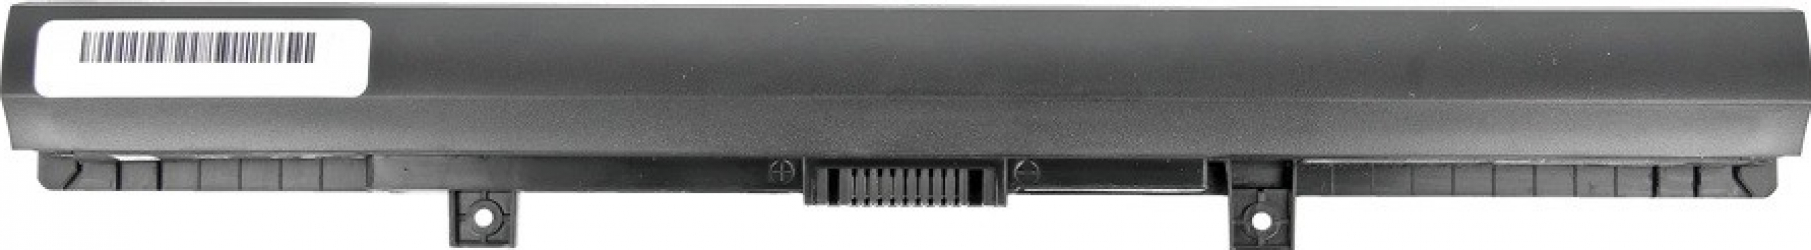 Baterie laptop Toshiba Satellite C50-B C55-C PA5186U-1BRS PA5186U-1BRS P000602620 G71C000HS510 P000616110 G71C000HV510